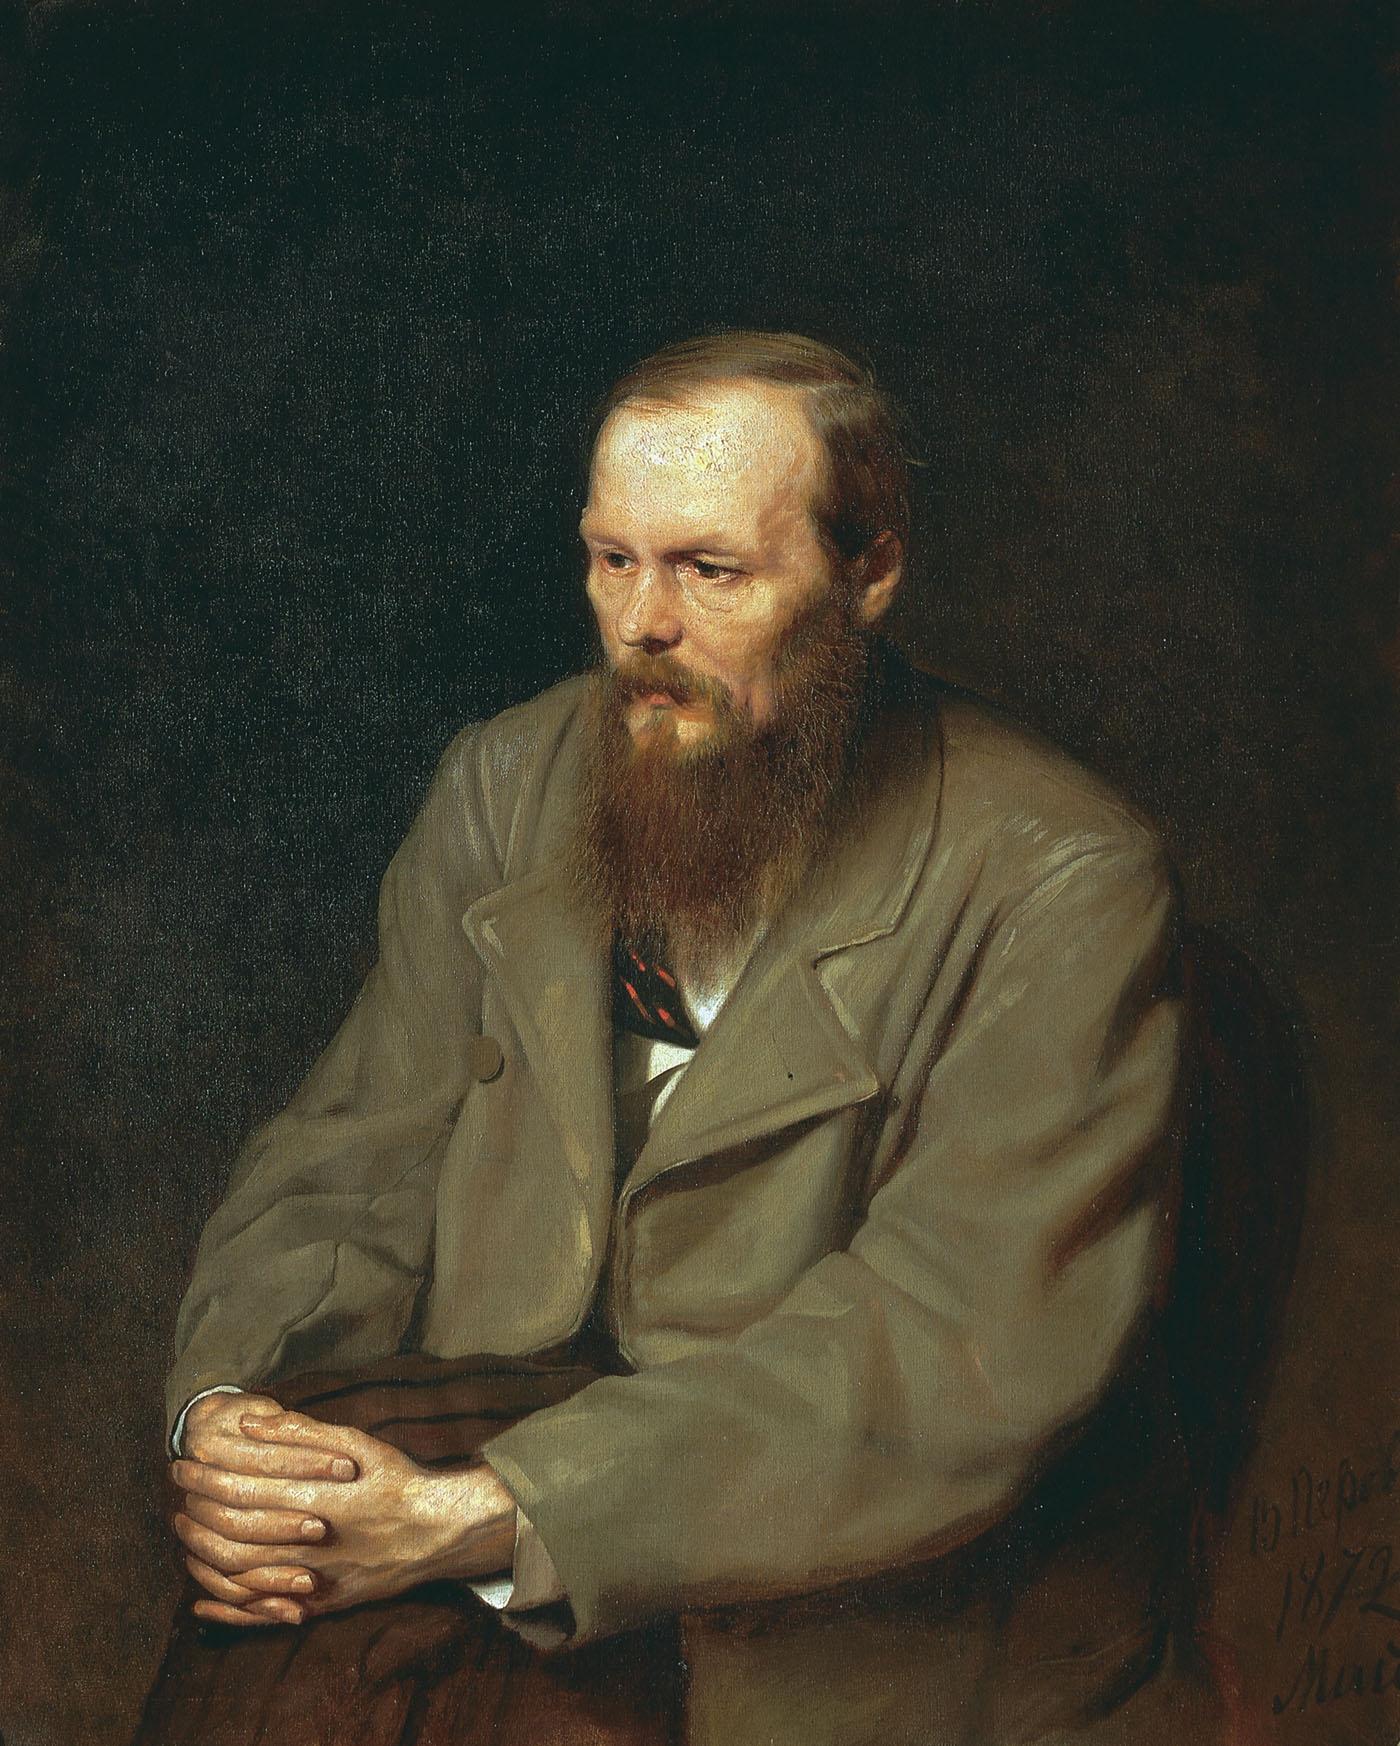 portrait-of-the-author-feodor-dostoyevsky-1872